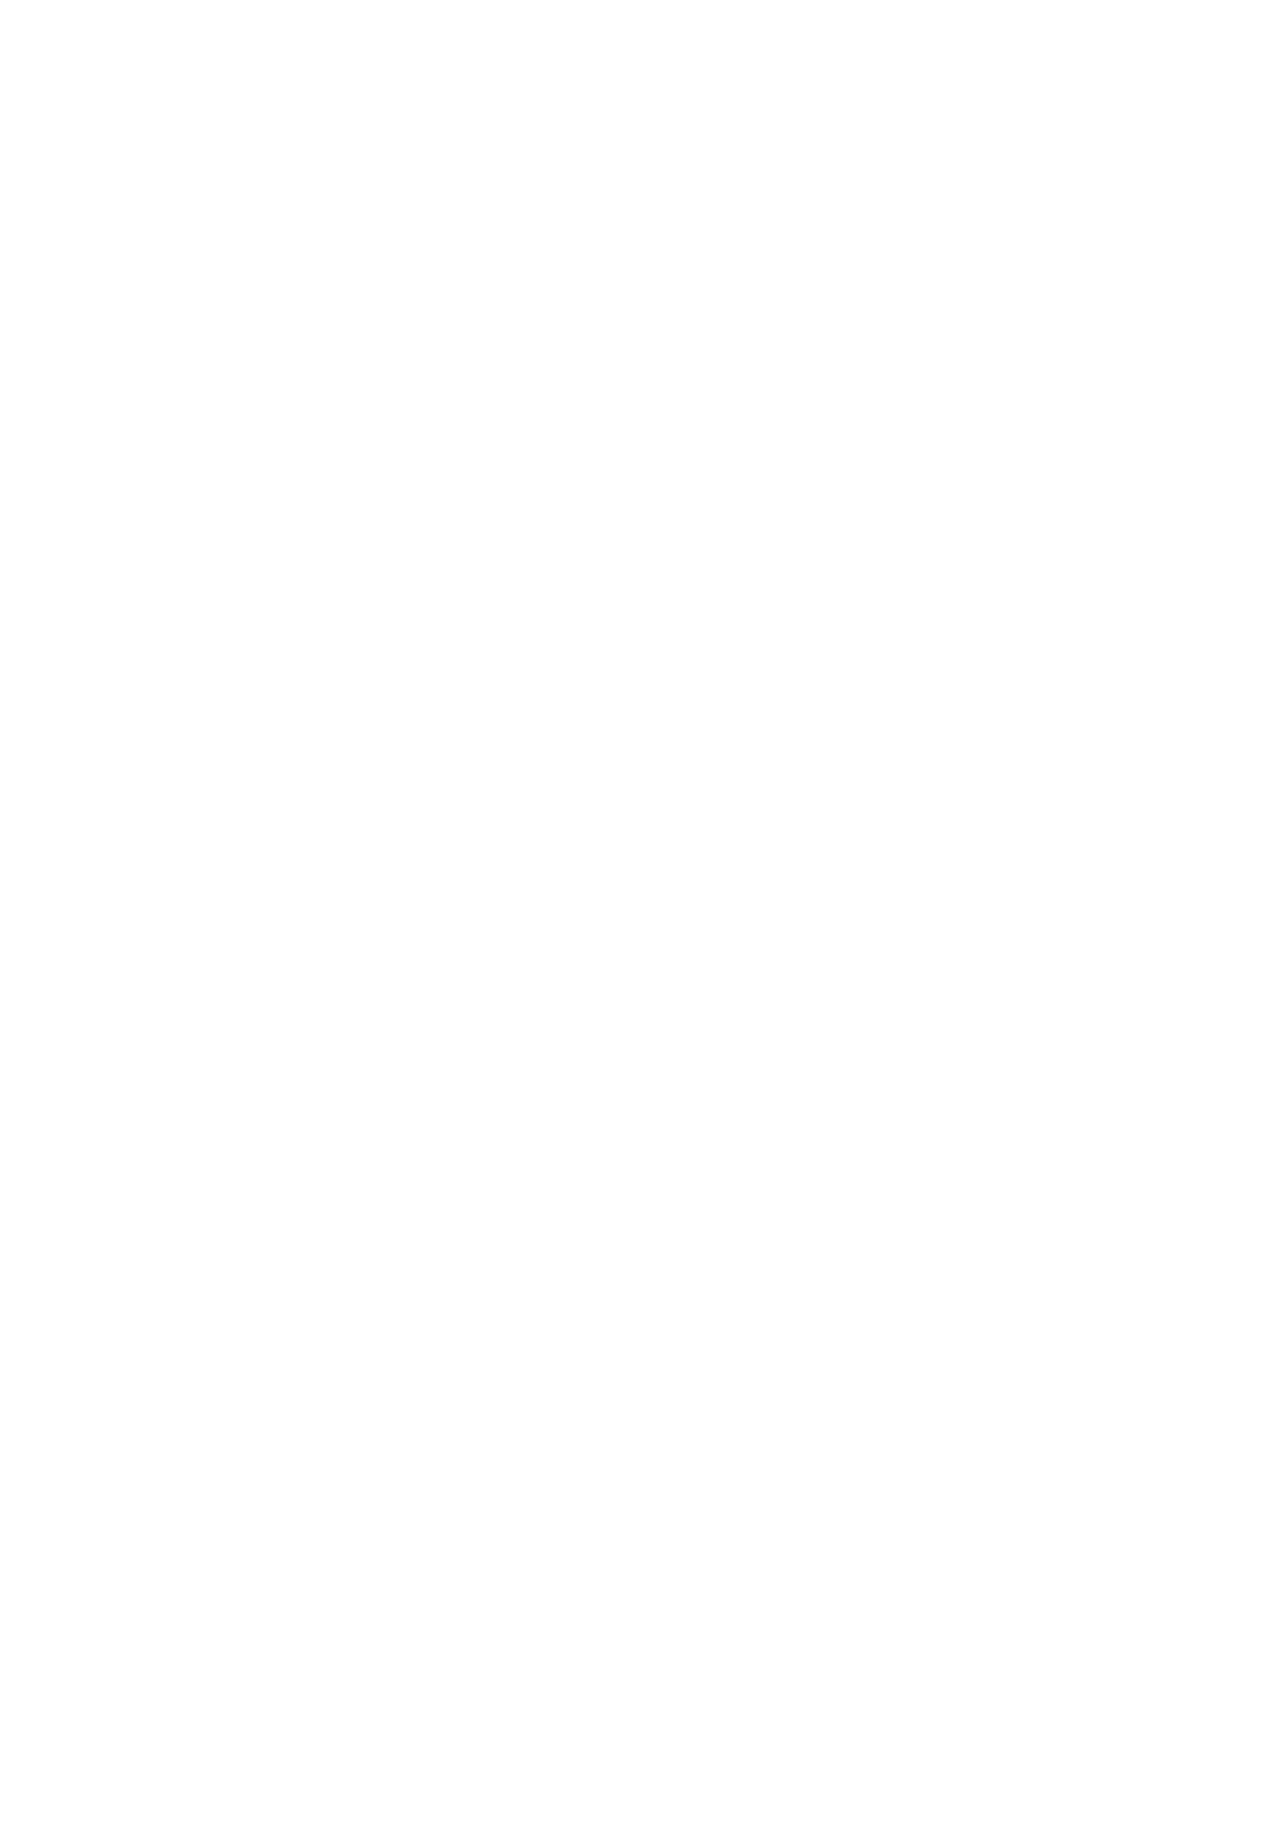 [Hanya Yashiki (Hanya)] Yobae Inko-chan S8   Nightcrawler Inko-chan S8 [English] {Mistvern + Bigk40k} [Digital] 18